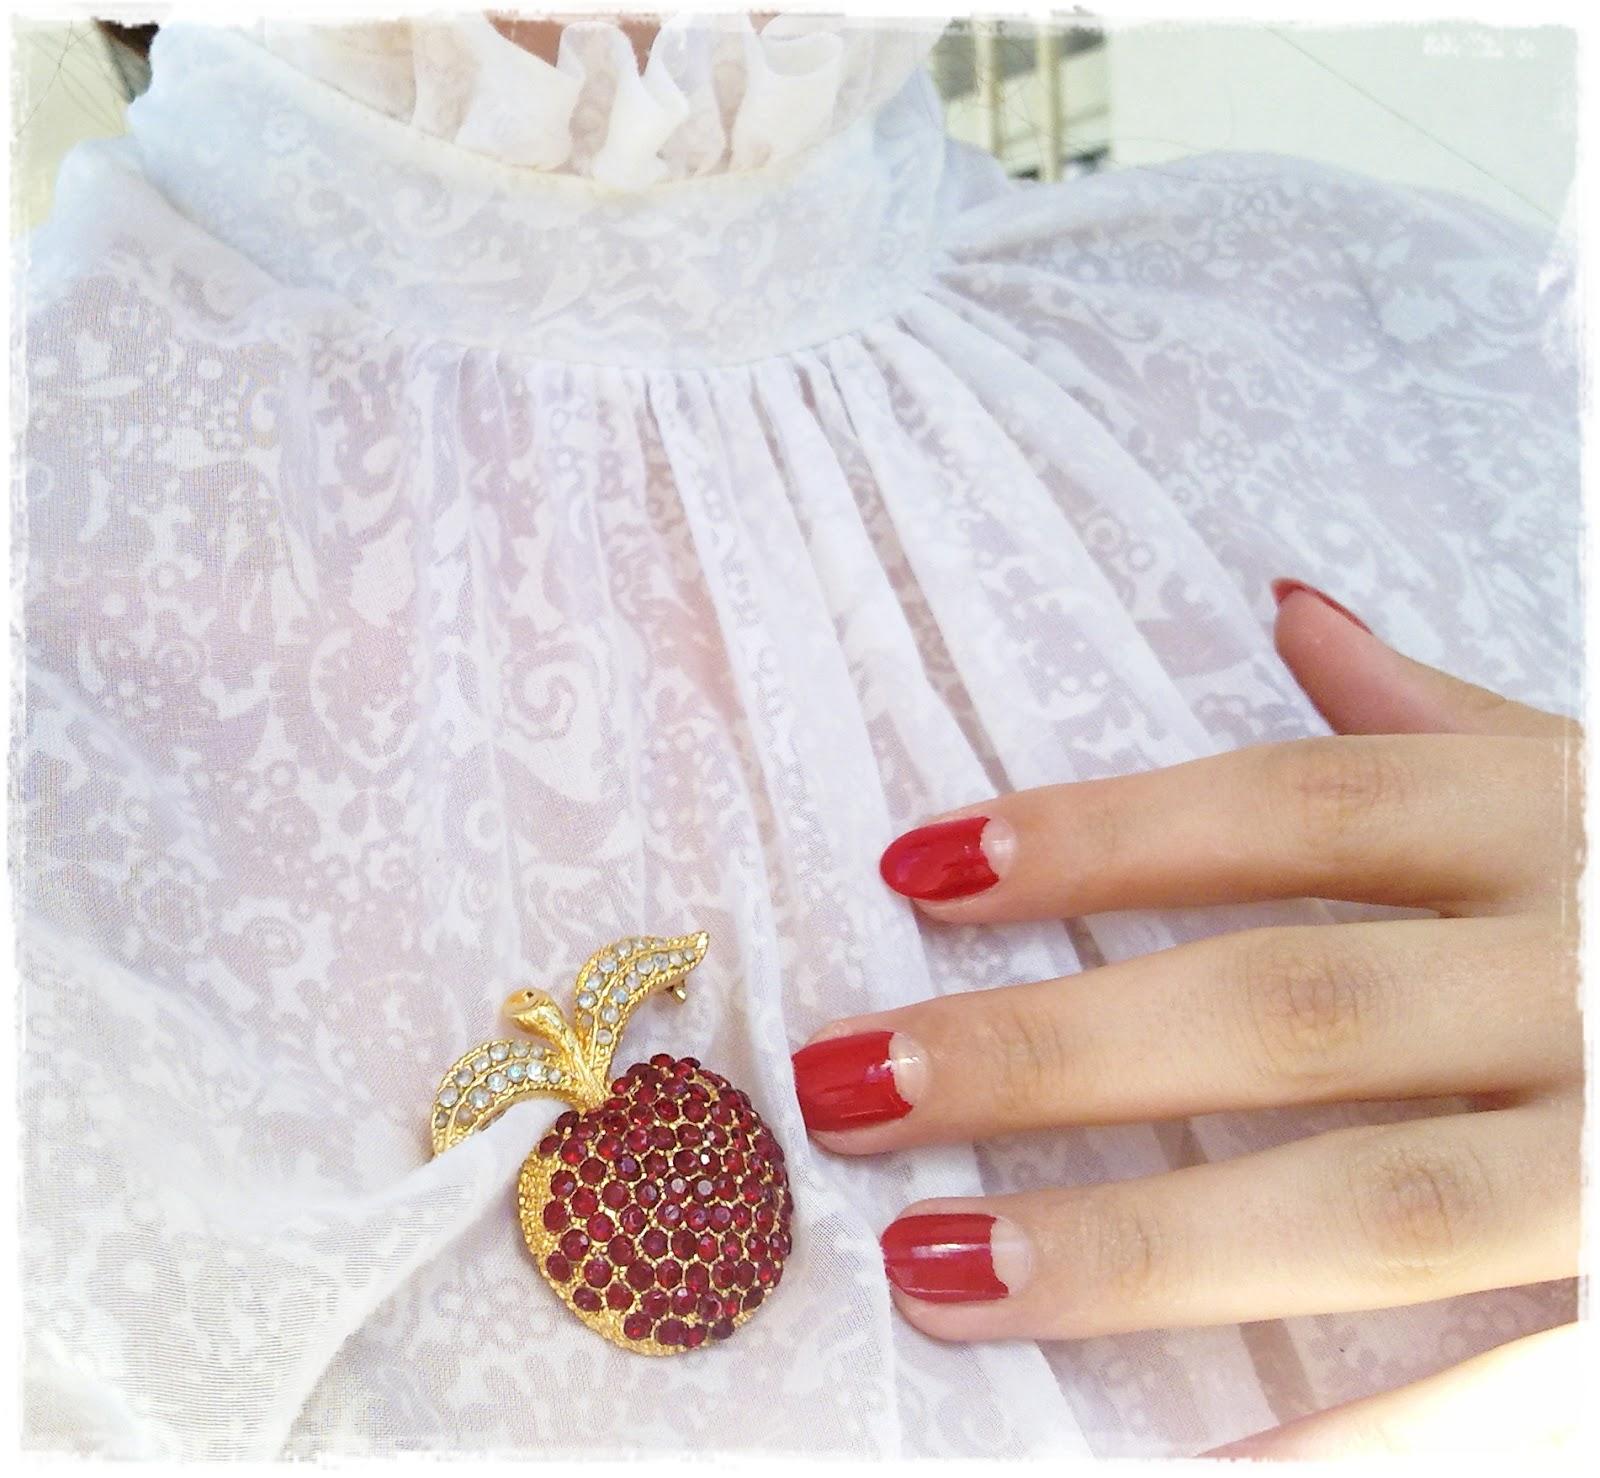 Idda van Munster: Half moon vintage nails